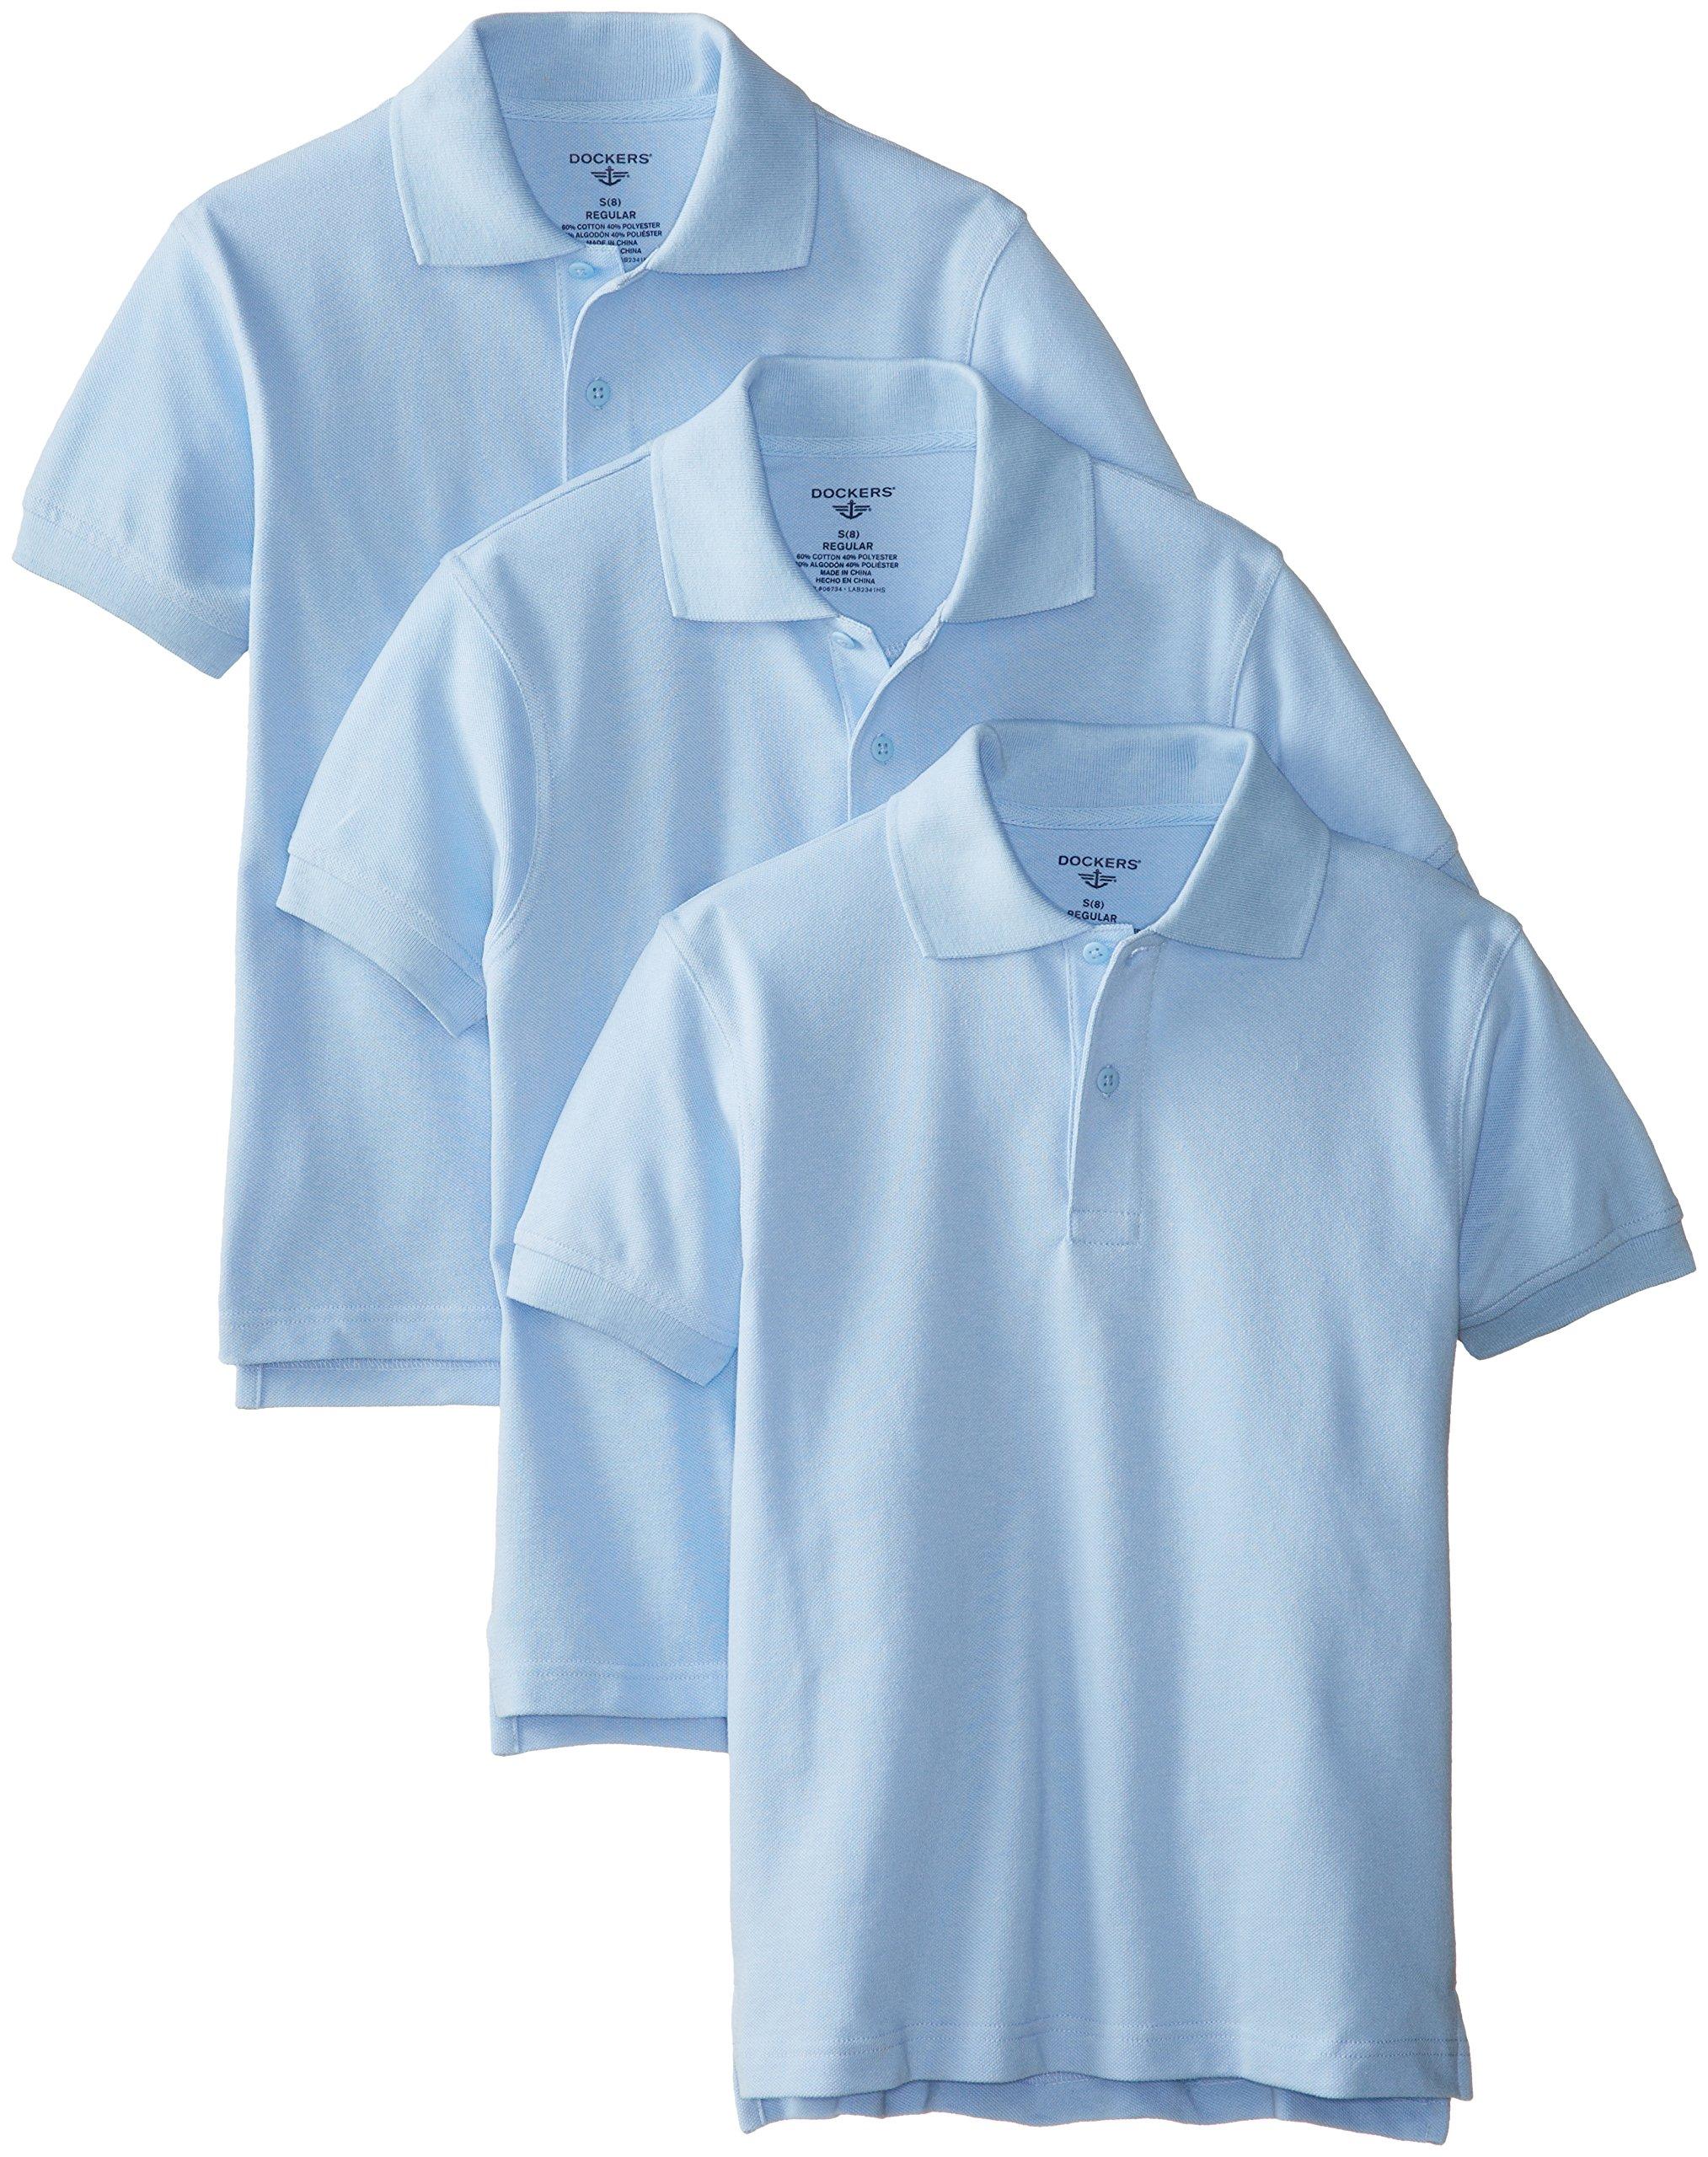 Dockers Big Boys' Uniform 3 Pack Short Sleeve Pique Polo Bundle, Light Blue, Medium/10/12